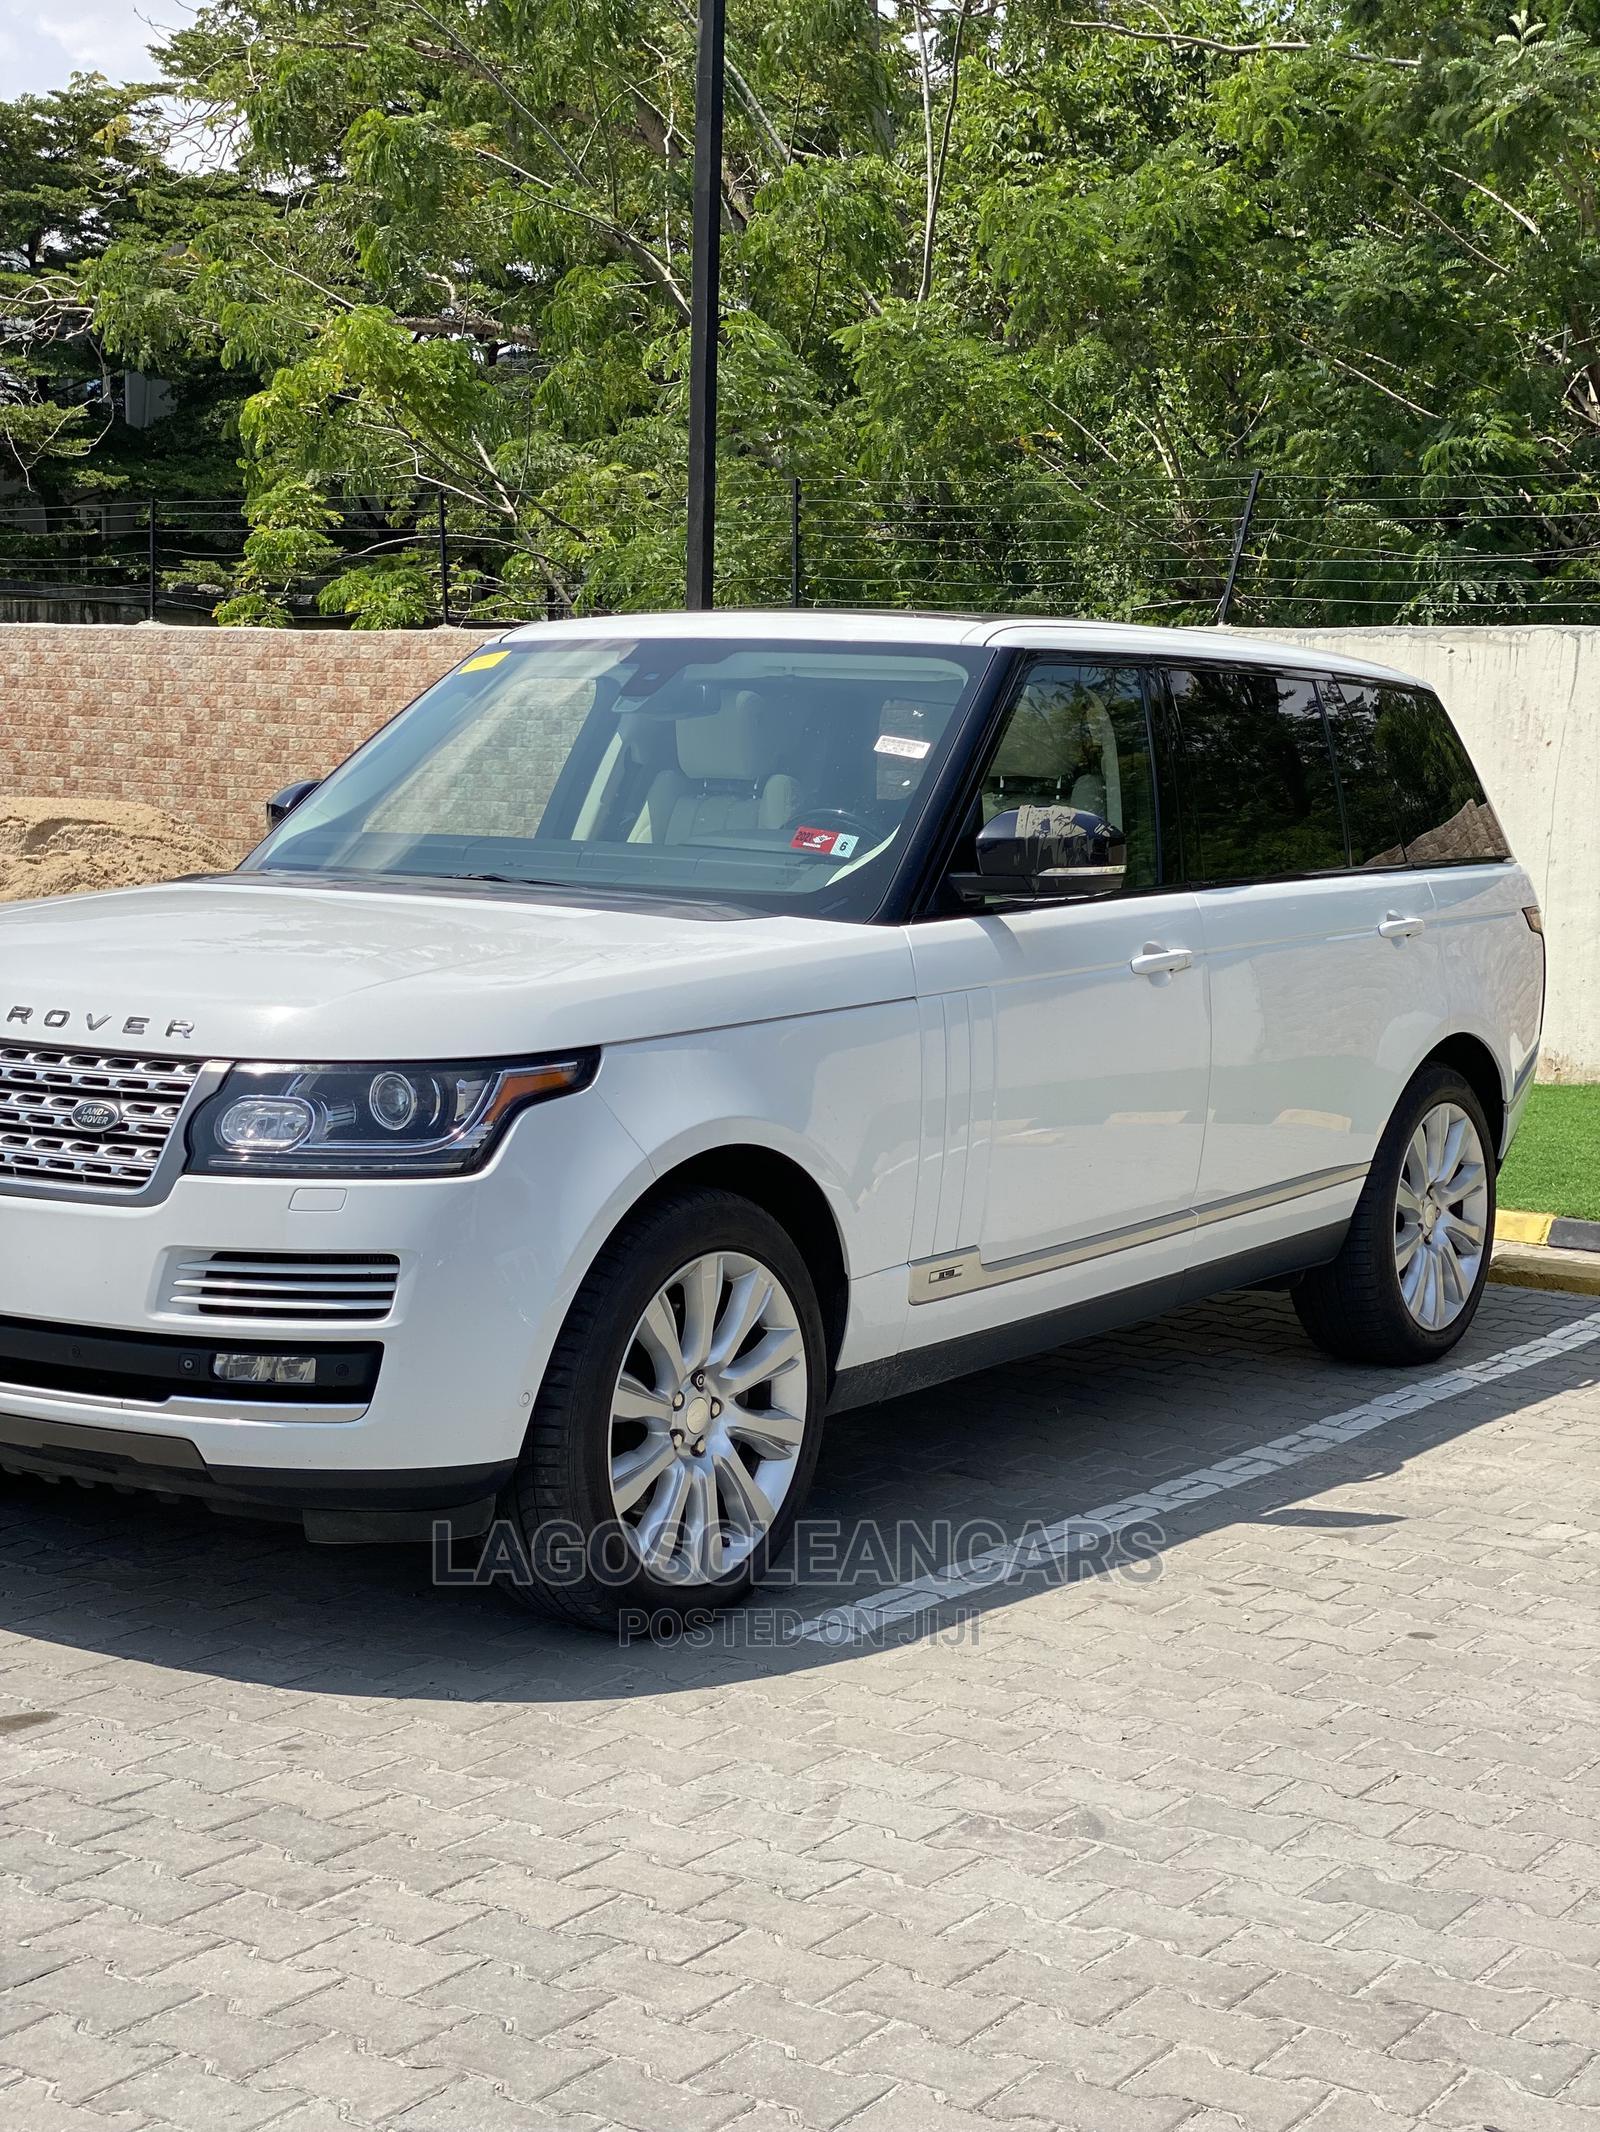 Archive: Land Rover Range Rover Vogue 2014 White